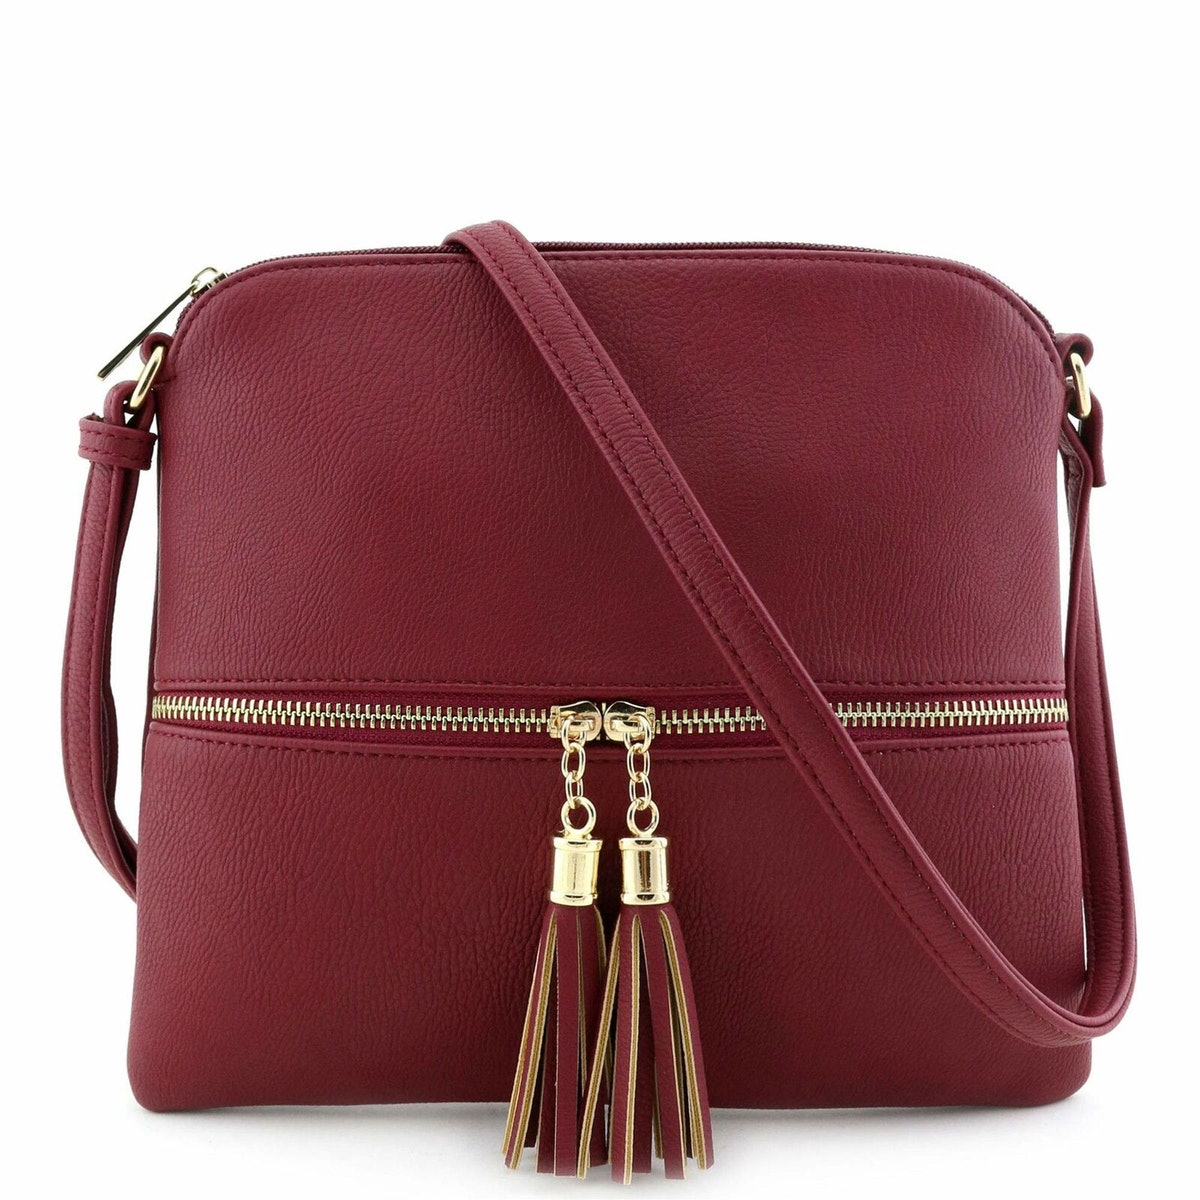 DELUXITY Lightweight Crossbody Bag